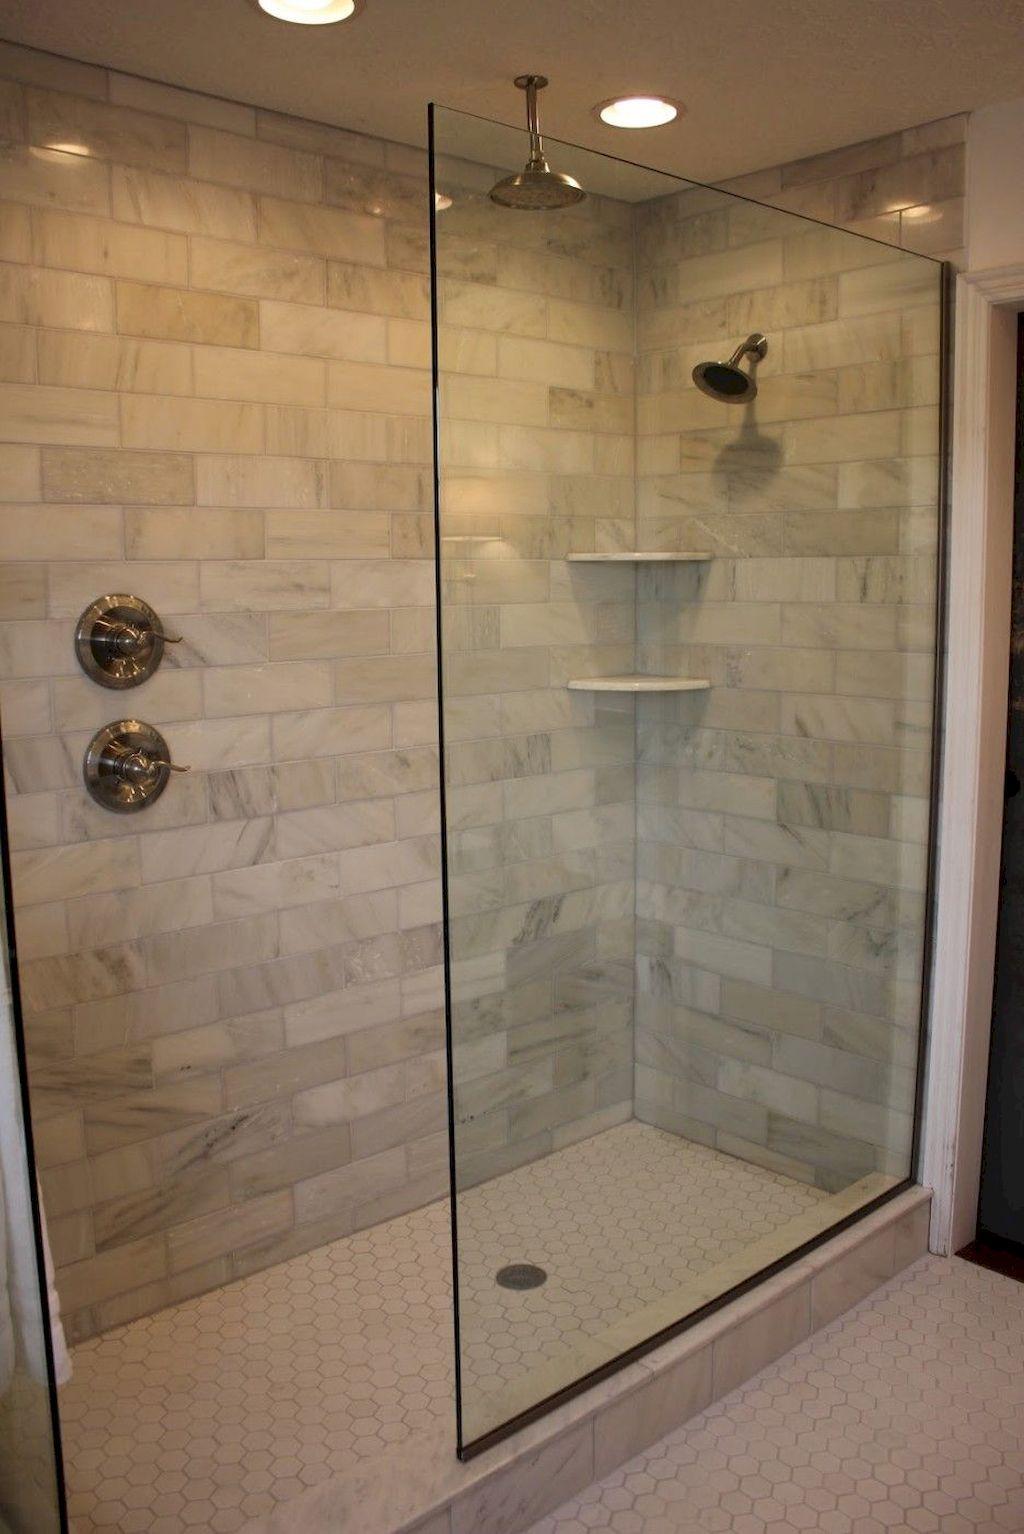 Cool 65 Beautiful Modern Bathroom Shower Ideas Https Homespecially Com 65 Beautiful Modern Bathroom Bathroom Remodel Master Bathrooms Remodel Shower Remodel